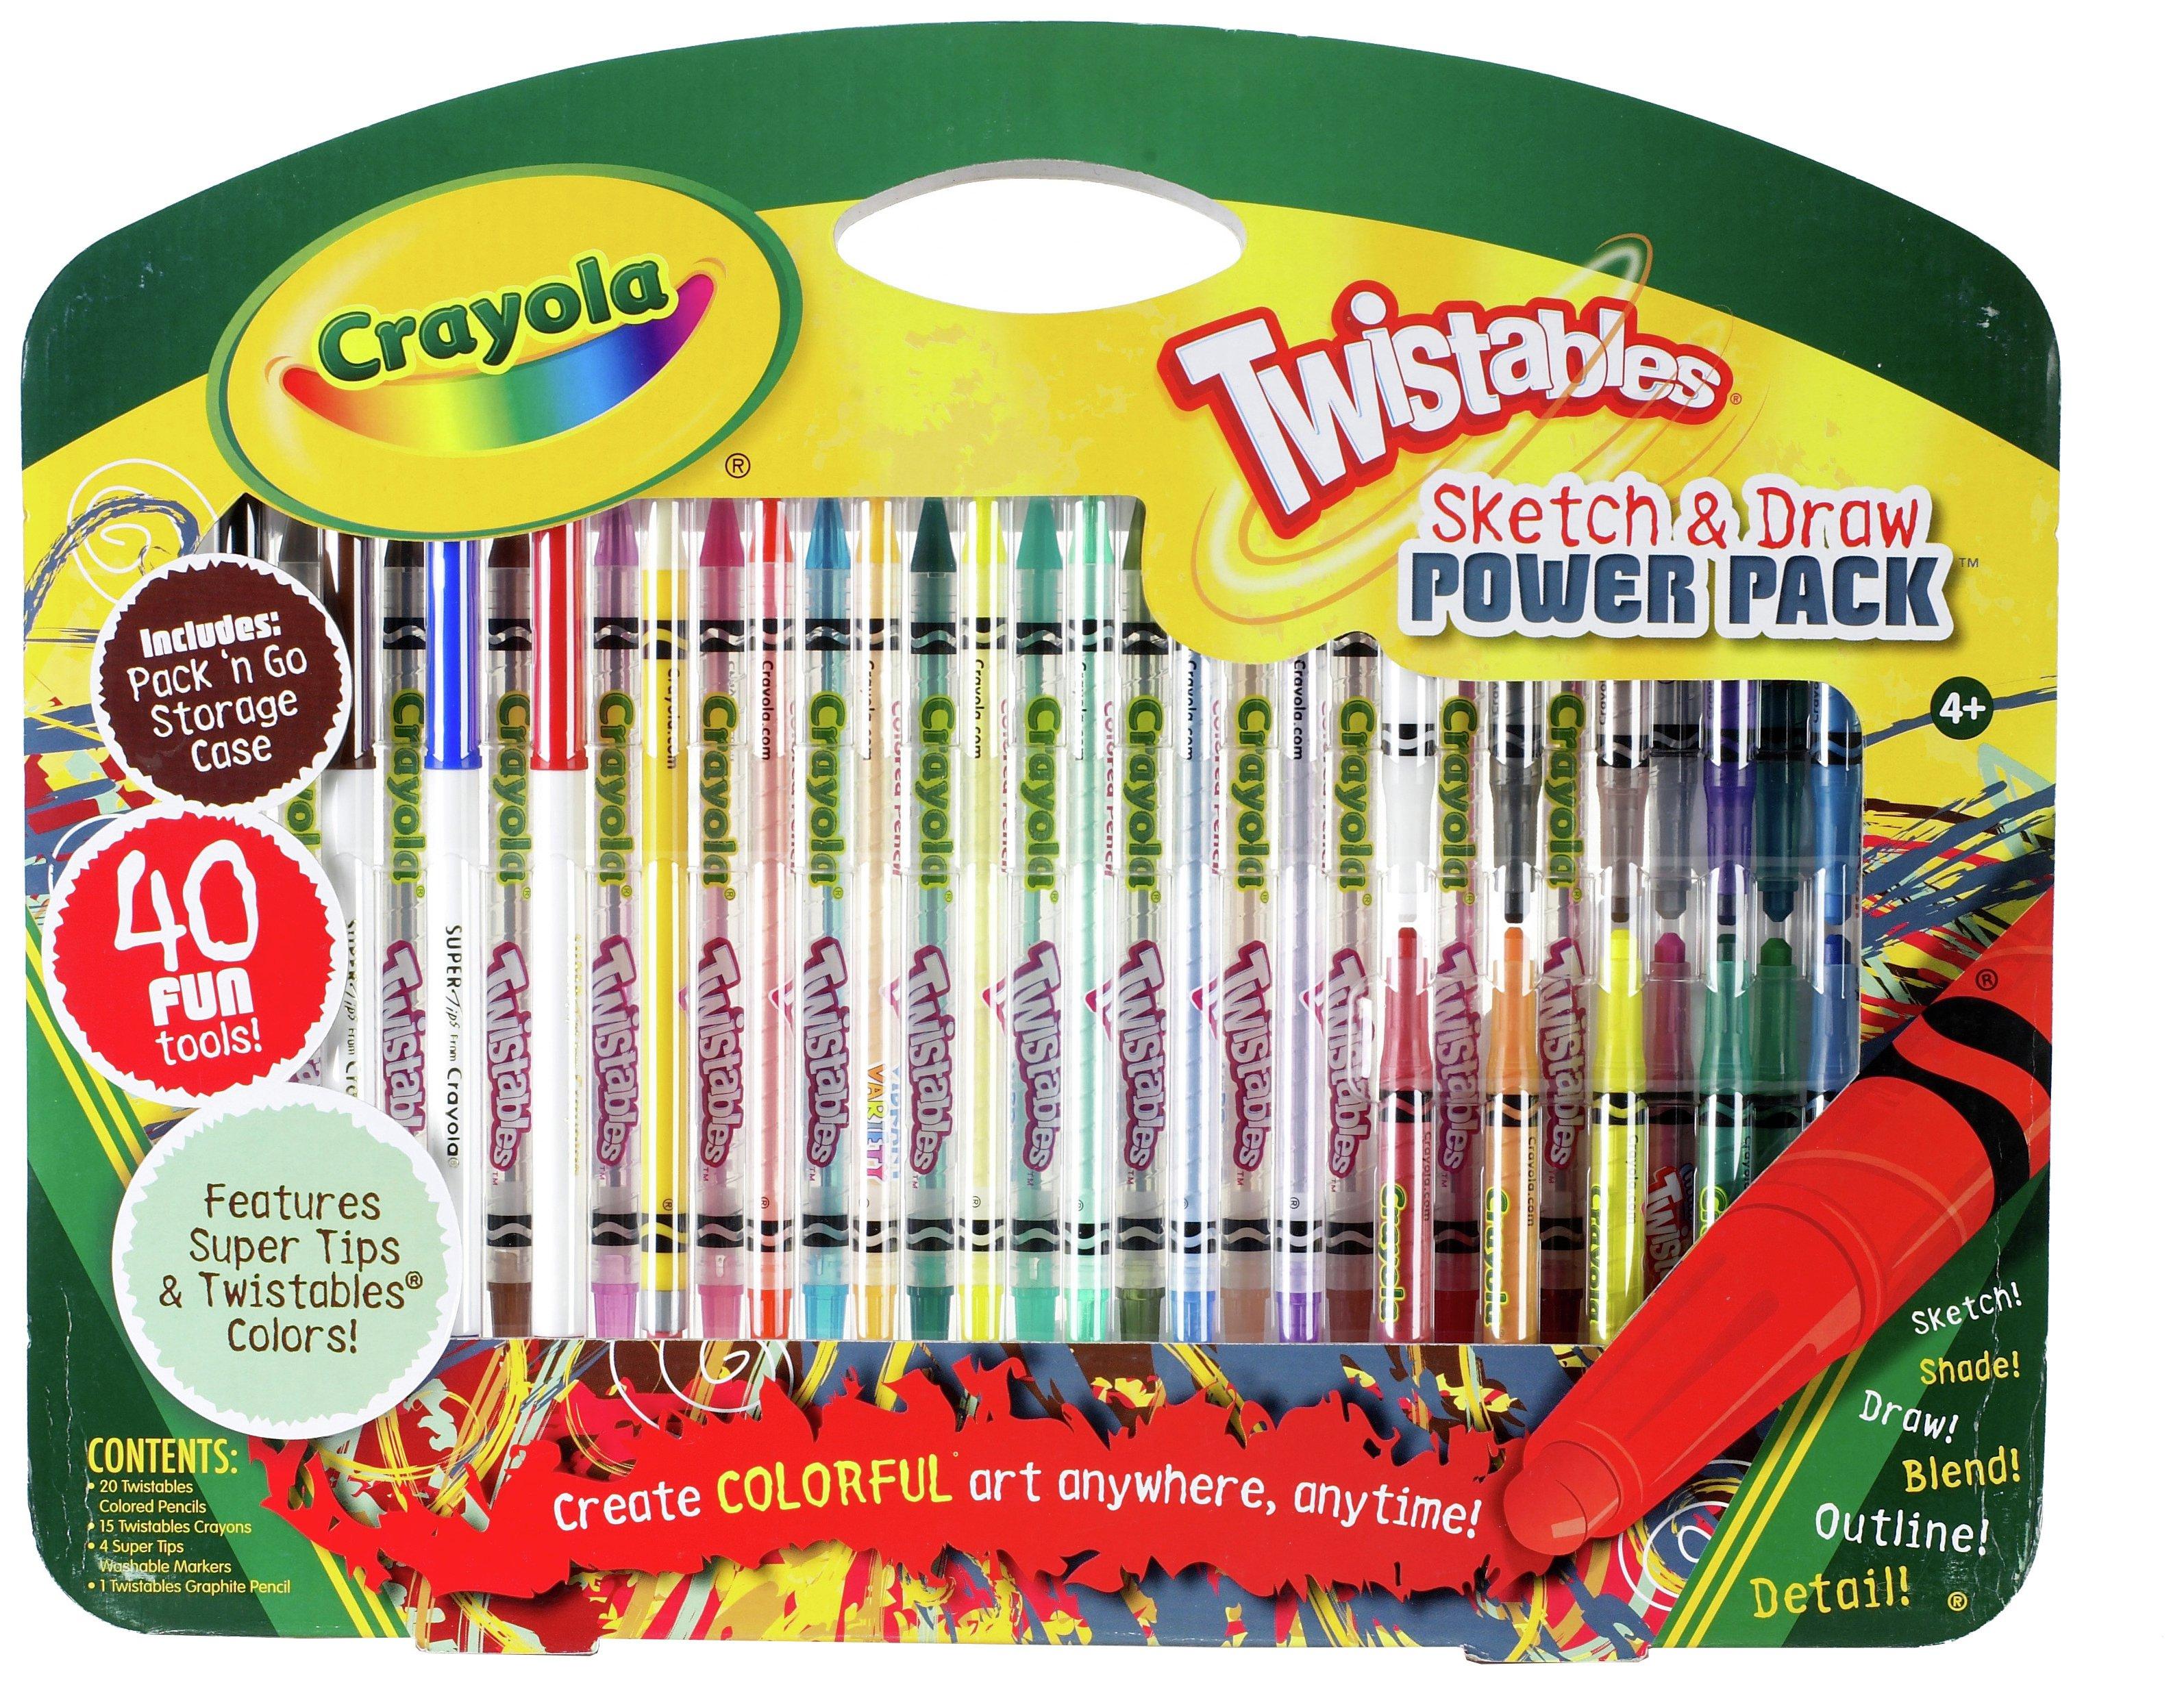 'Crayola Twistables Sketch And Draw Set